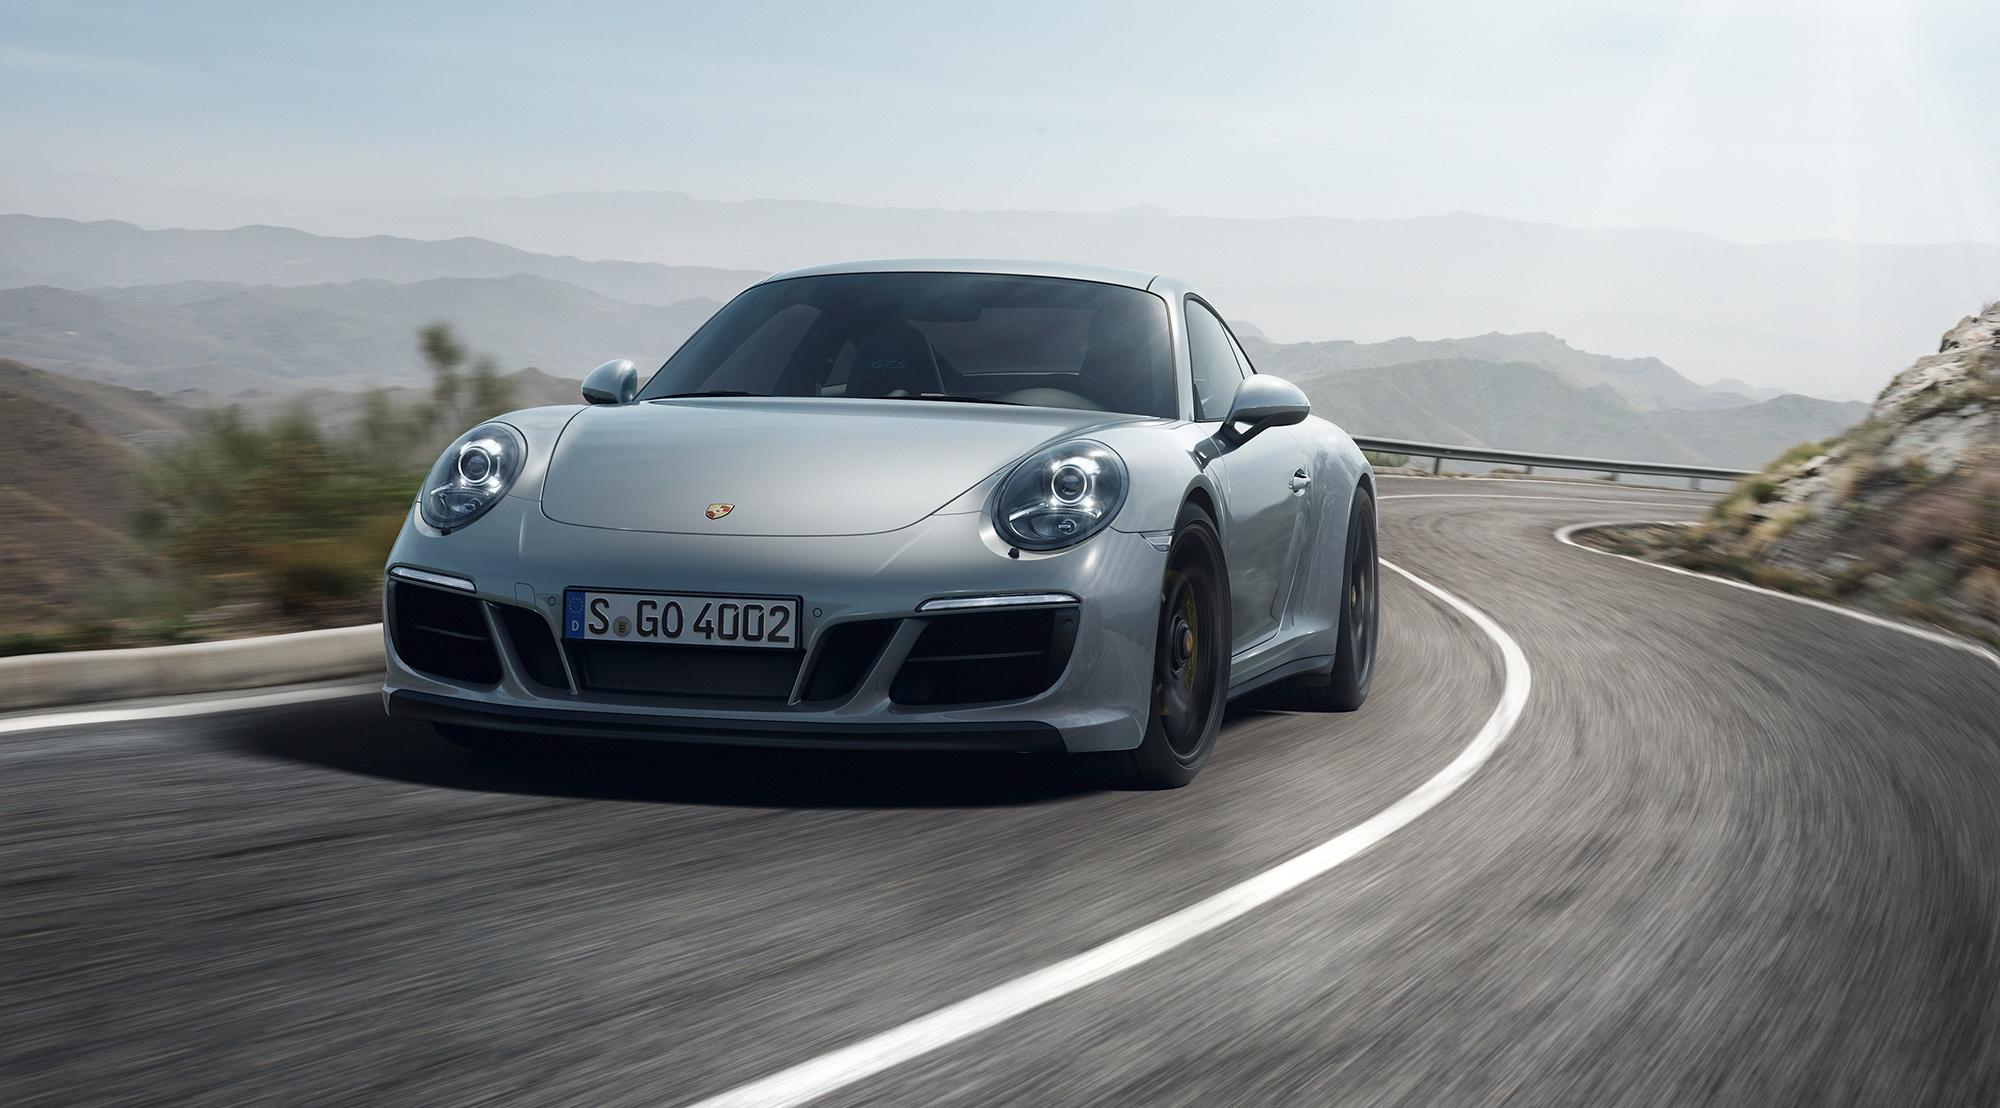 Pictures Of Porsche 911 Gts